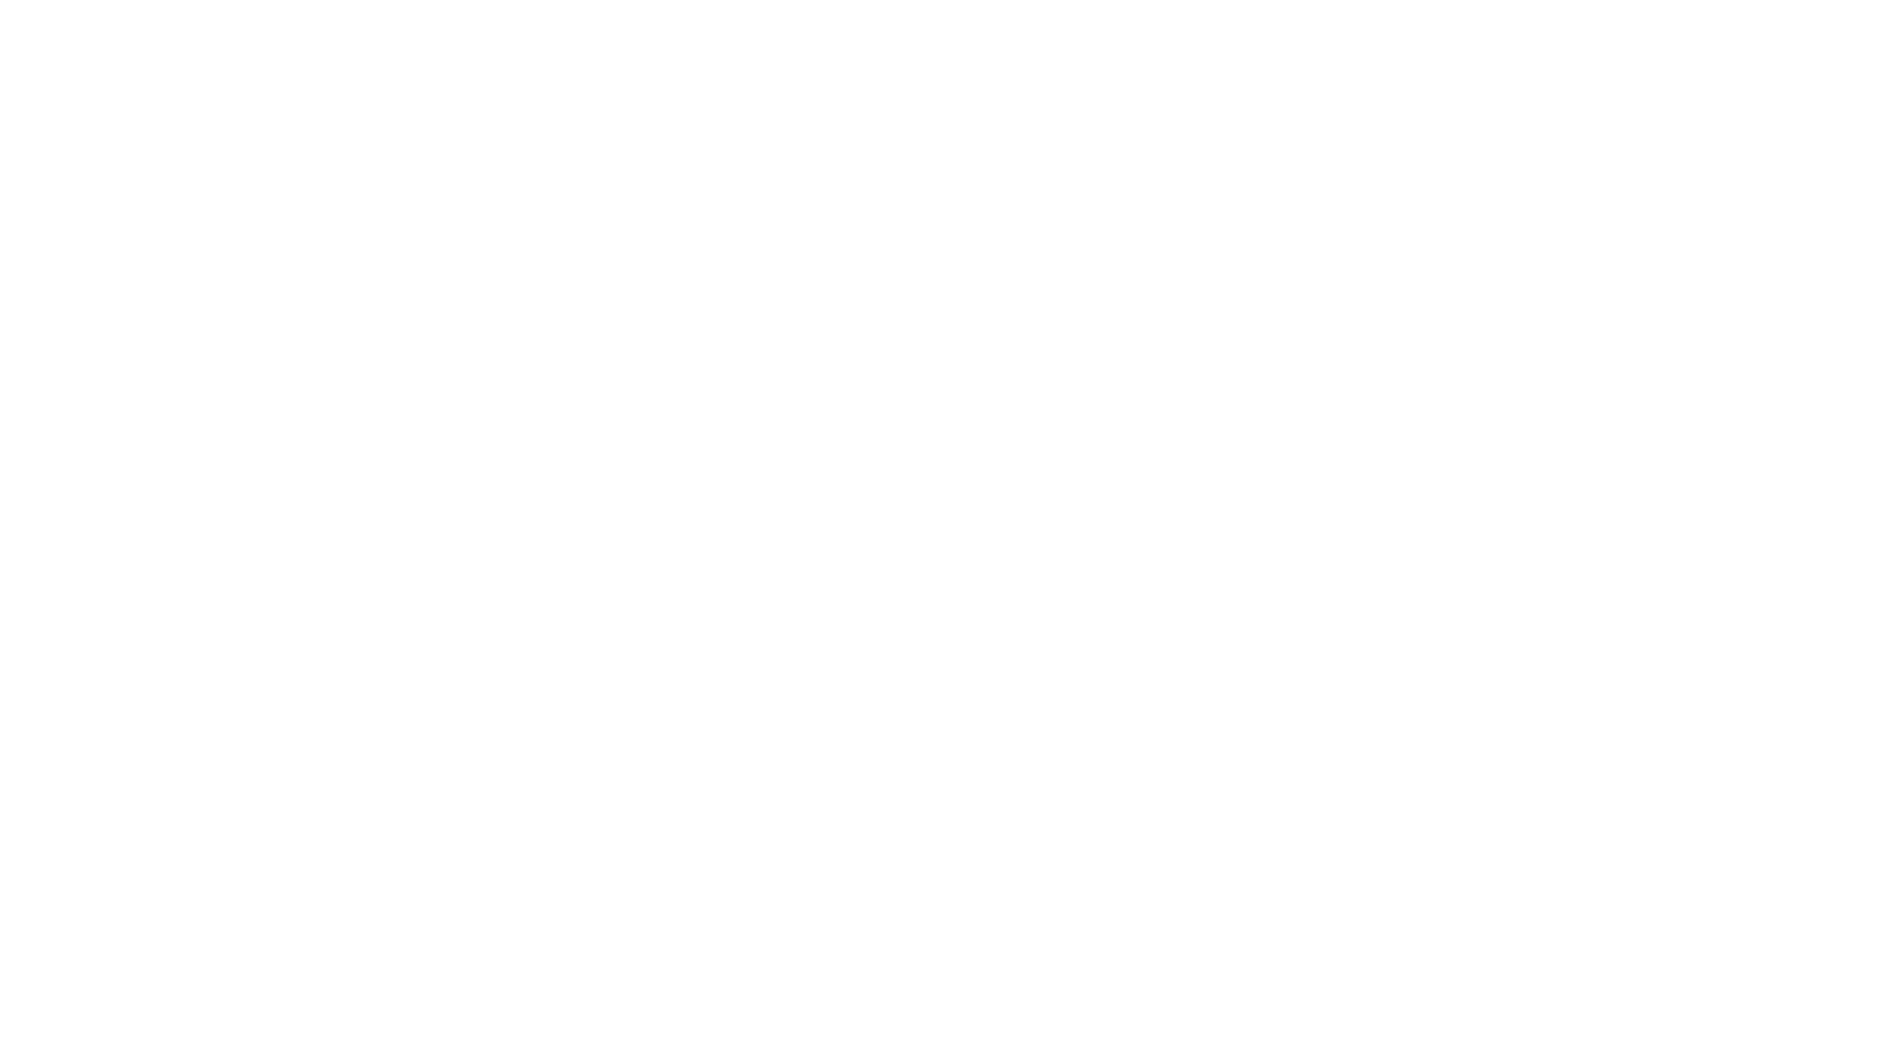 Logo-doc-17.png